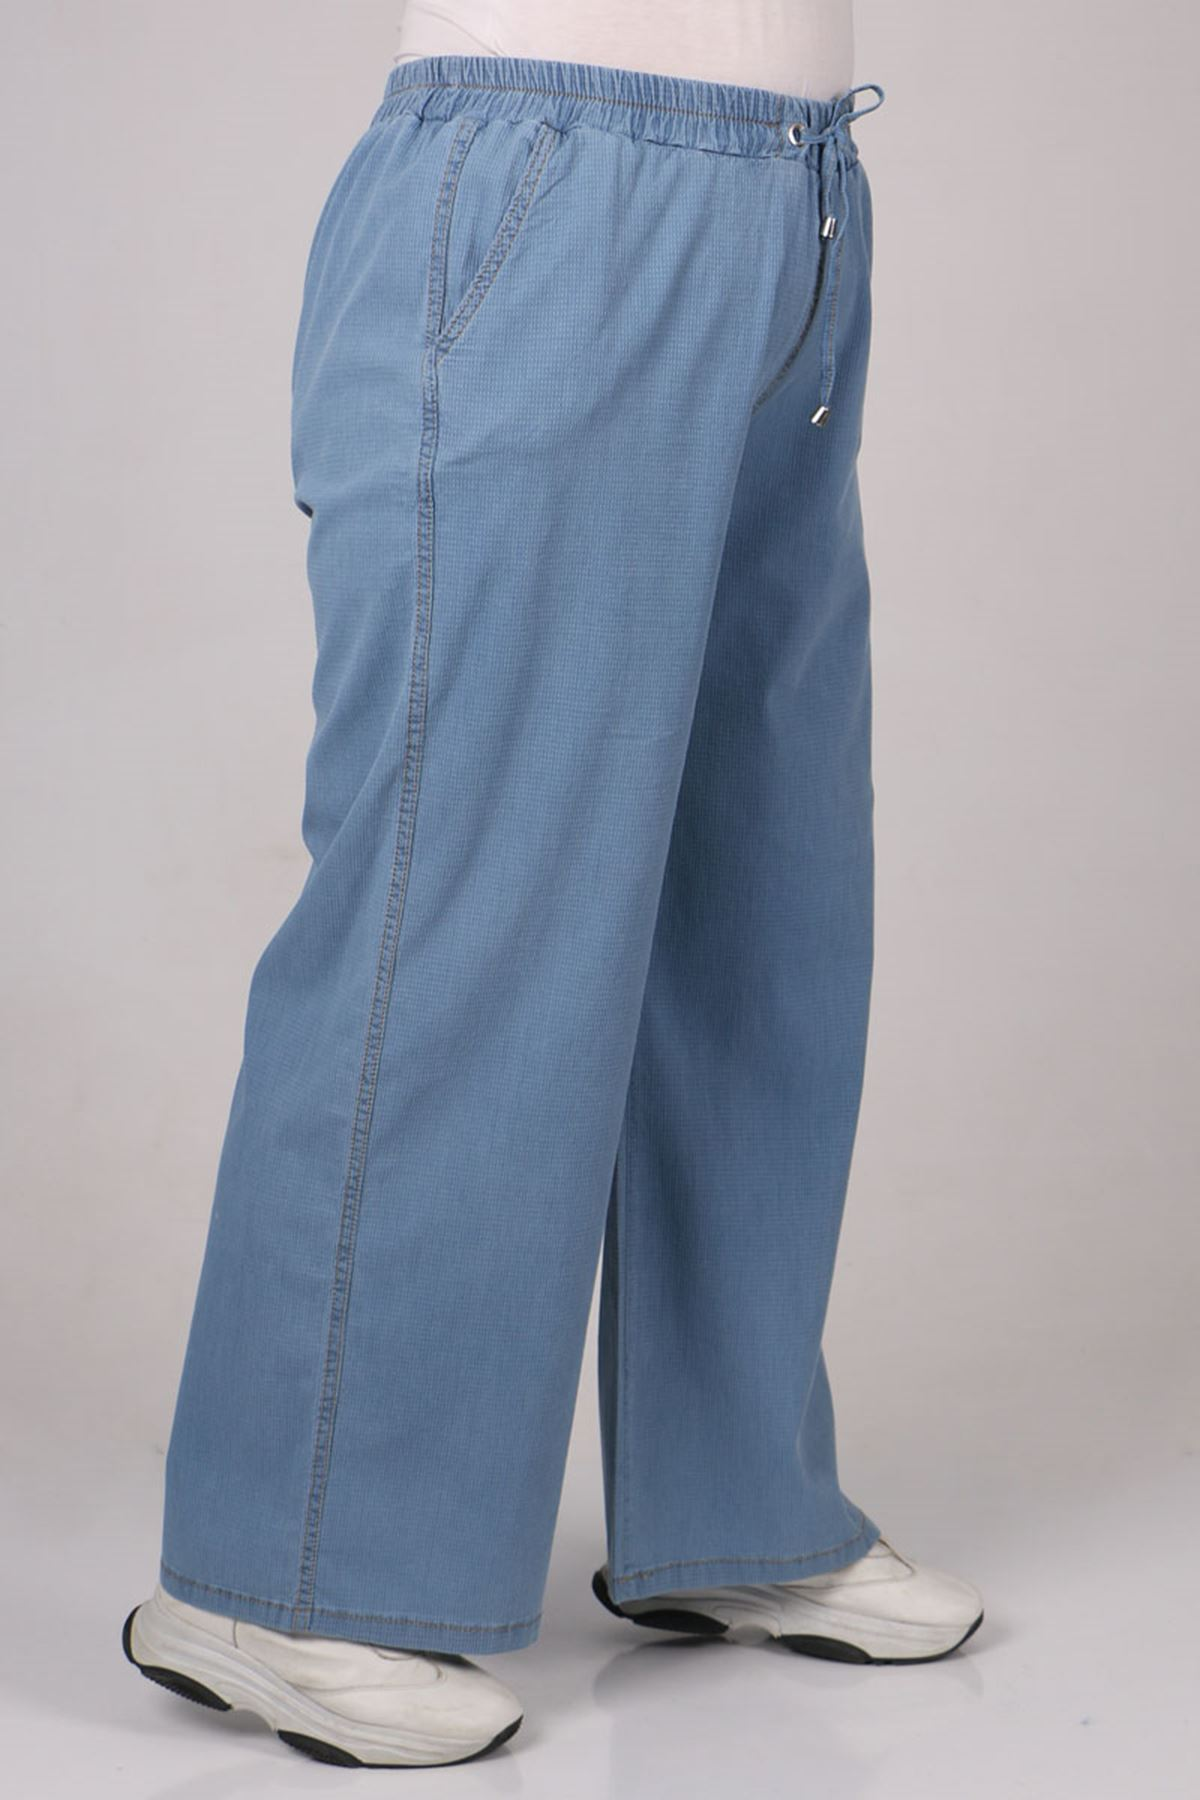 9175 Büyük Beden Bol Paça Kot Pantolon - Mavi